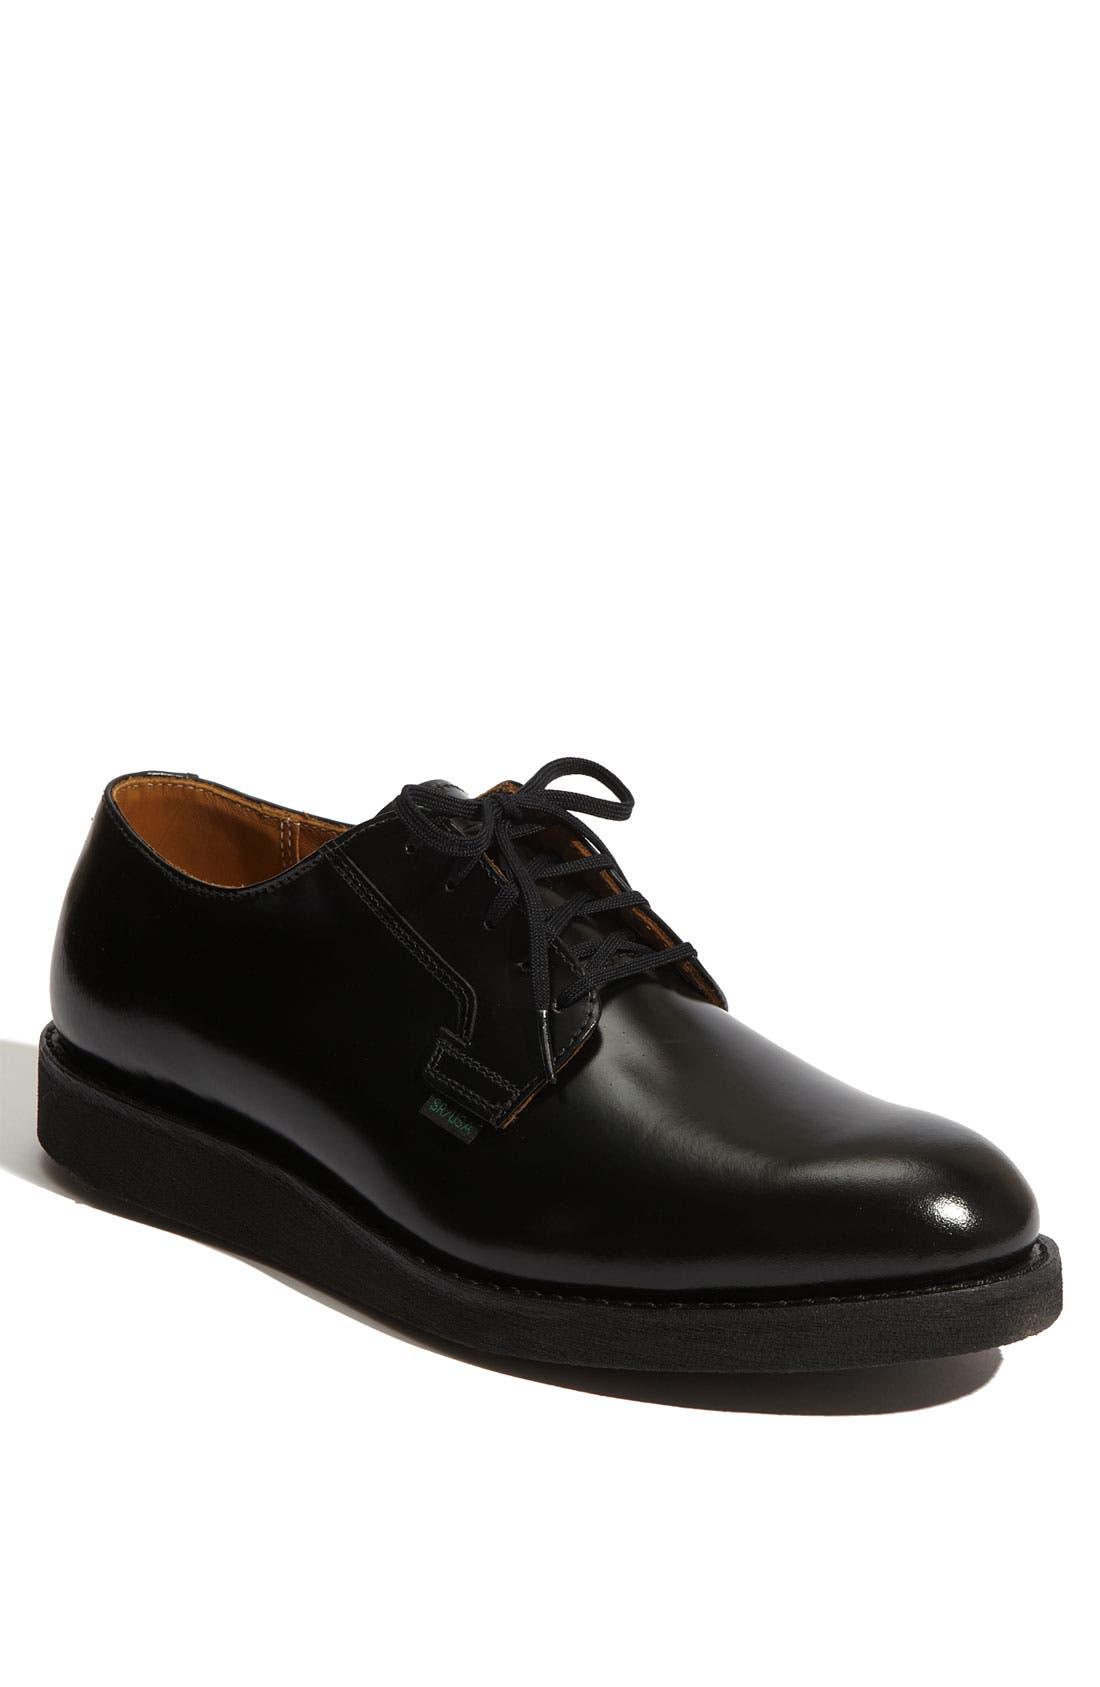 'Postman' Oxford,                         Main,                         color, BLACK- 101